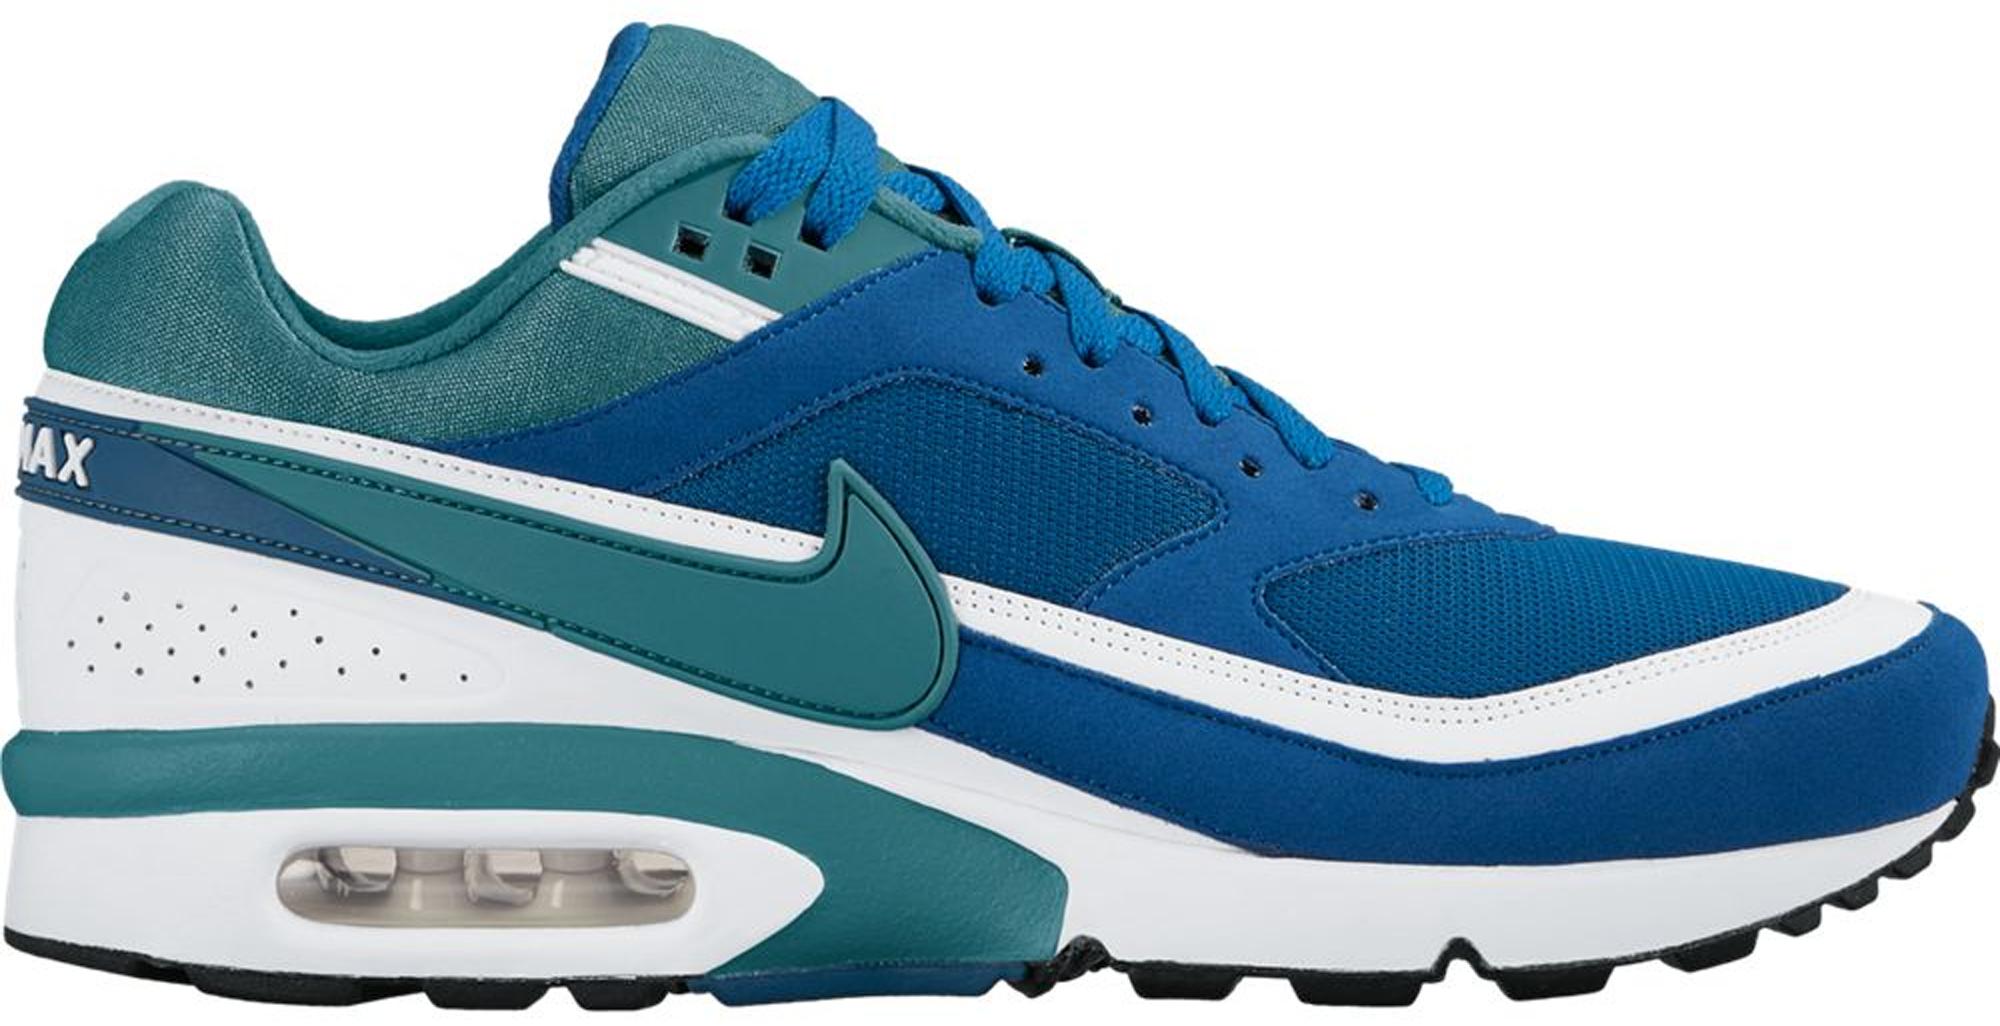 Nike Air Max BW Marina Grey Jade